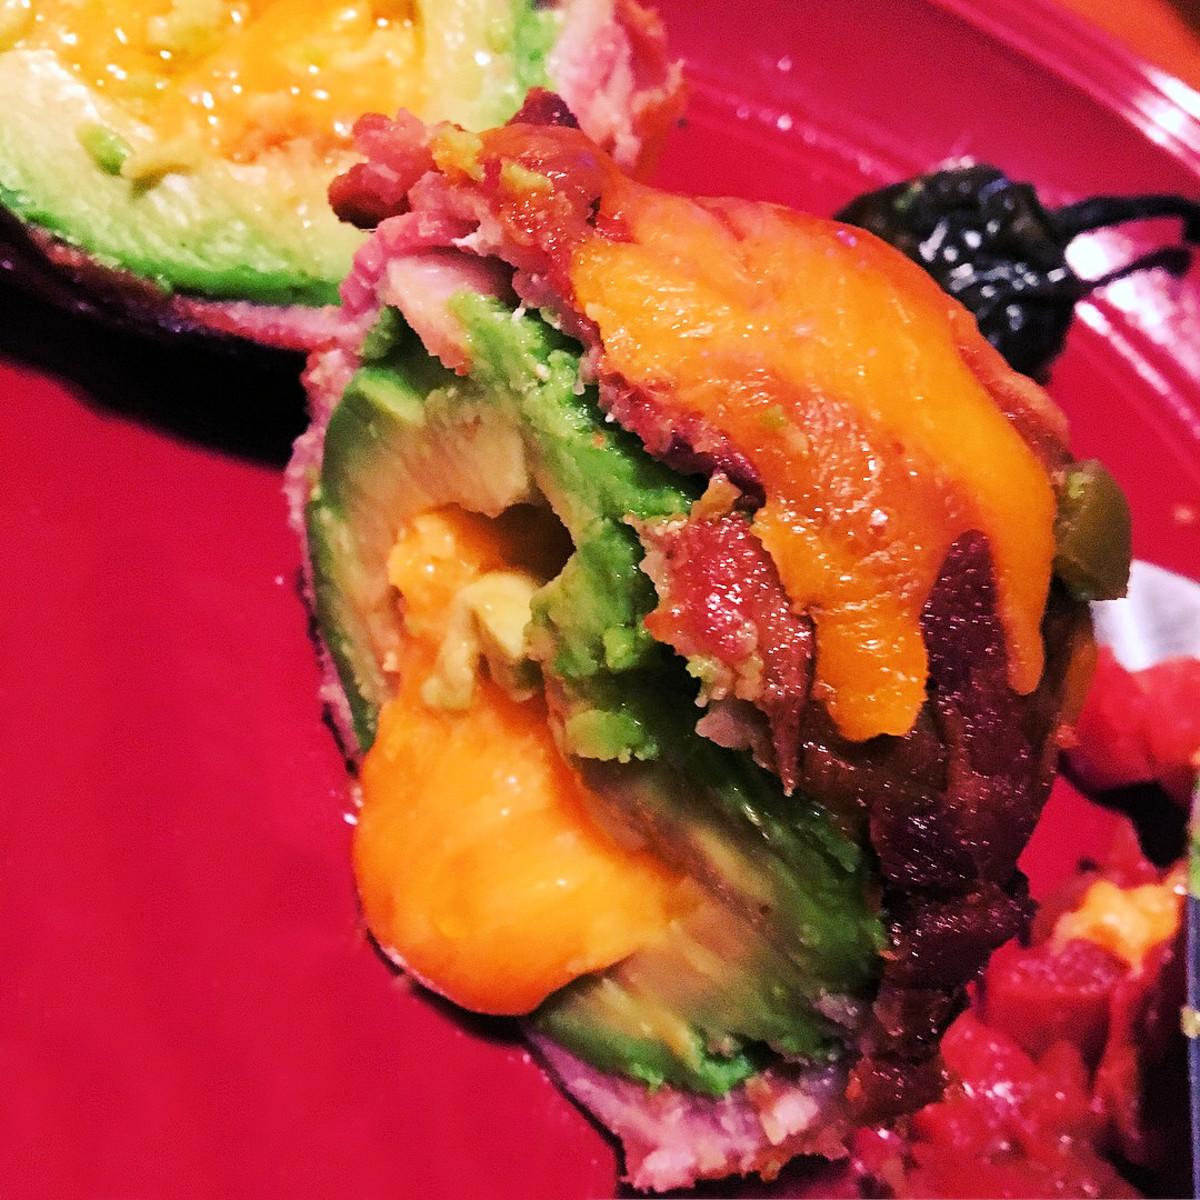 Bacon-Wrapped, Stuffed Avocado